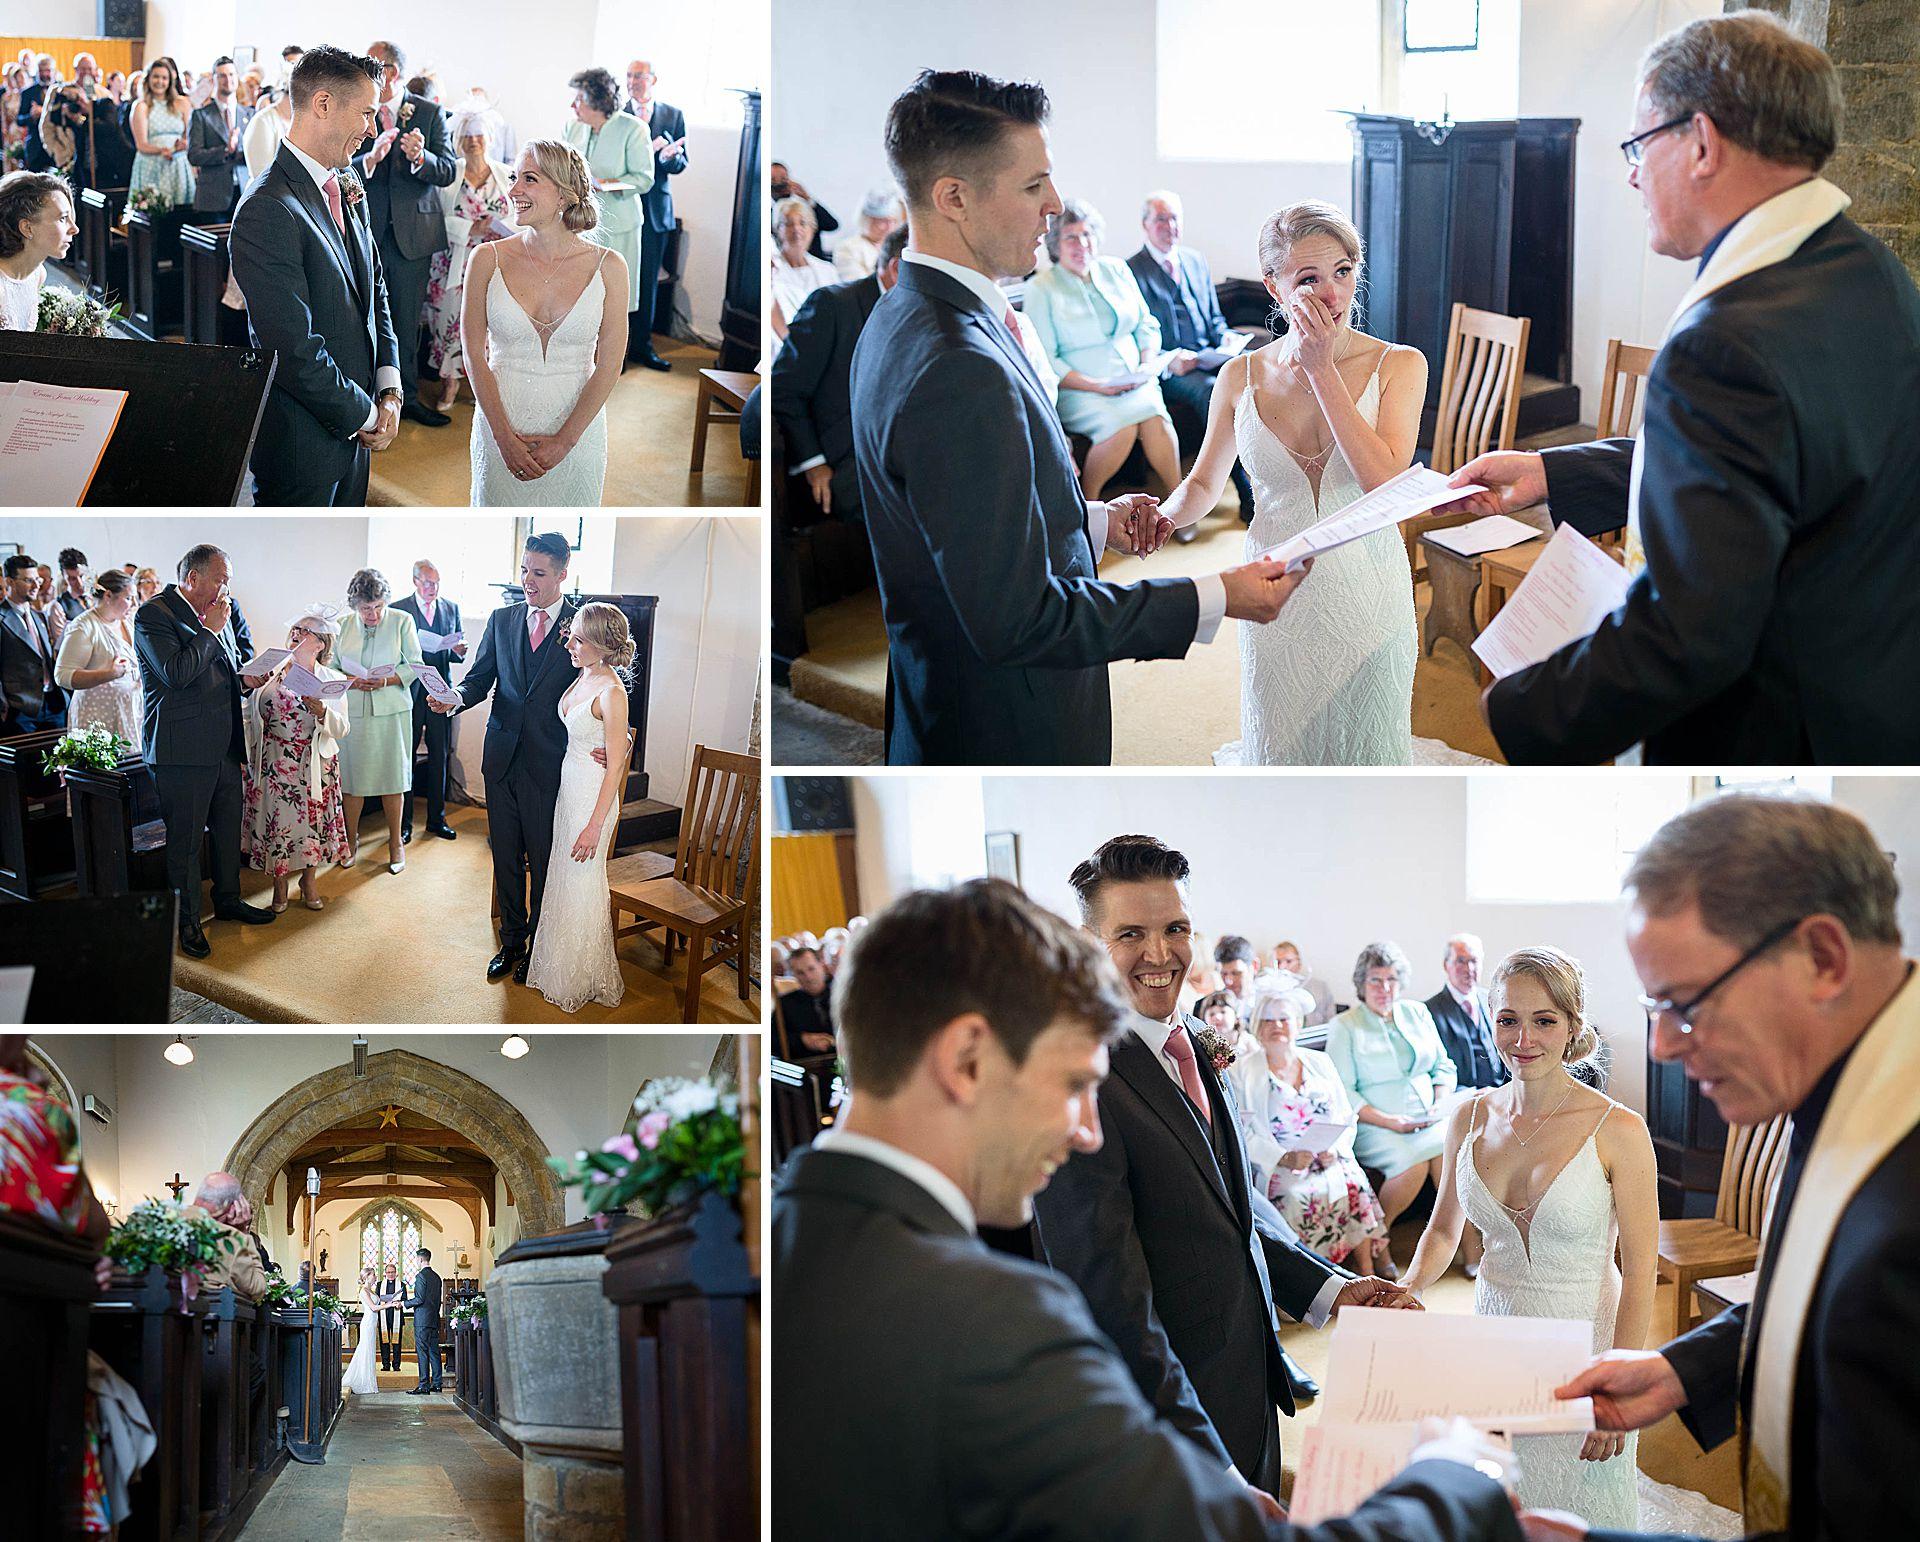 St Annes Church Epwell Wedding